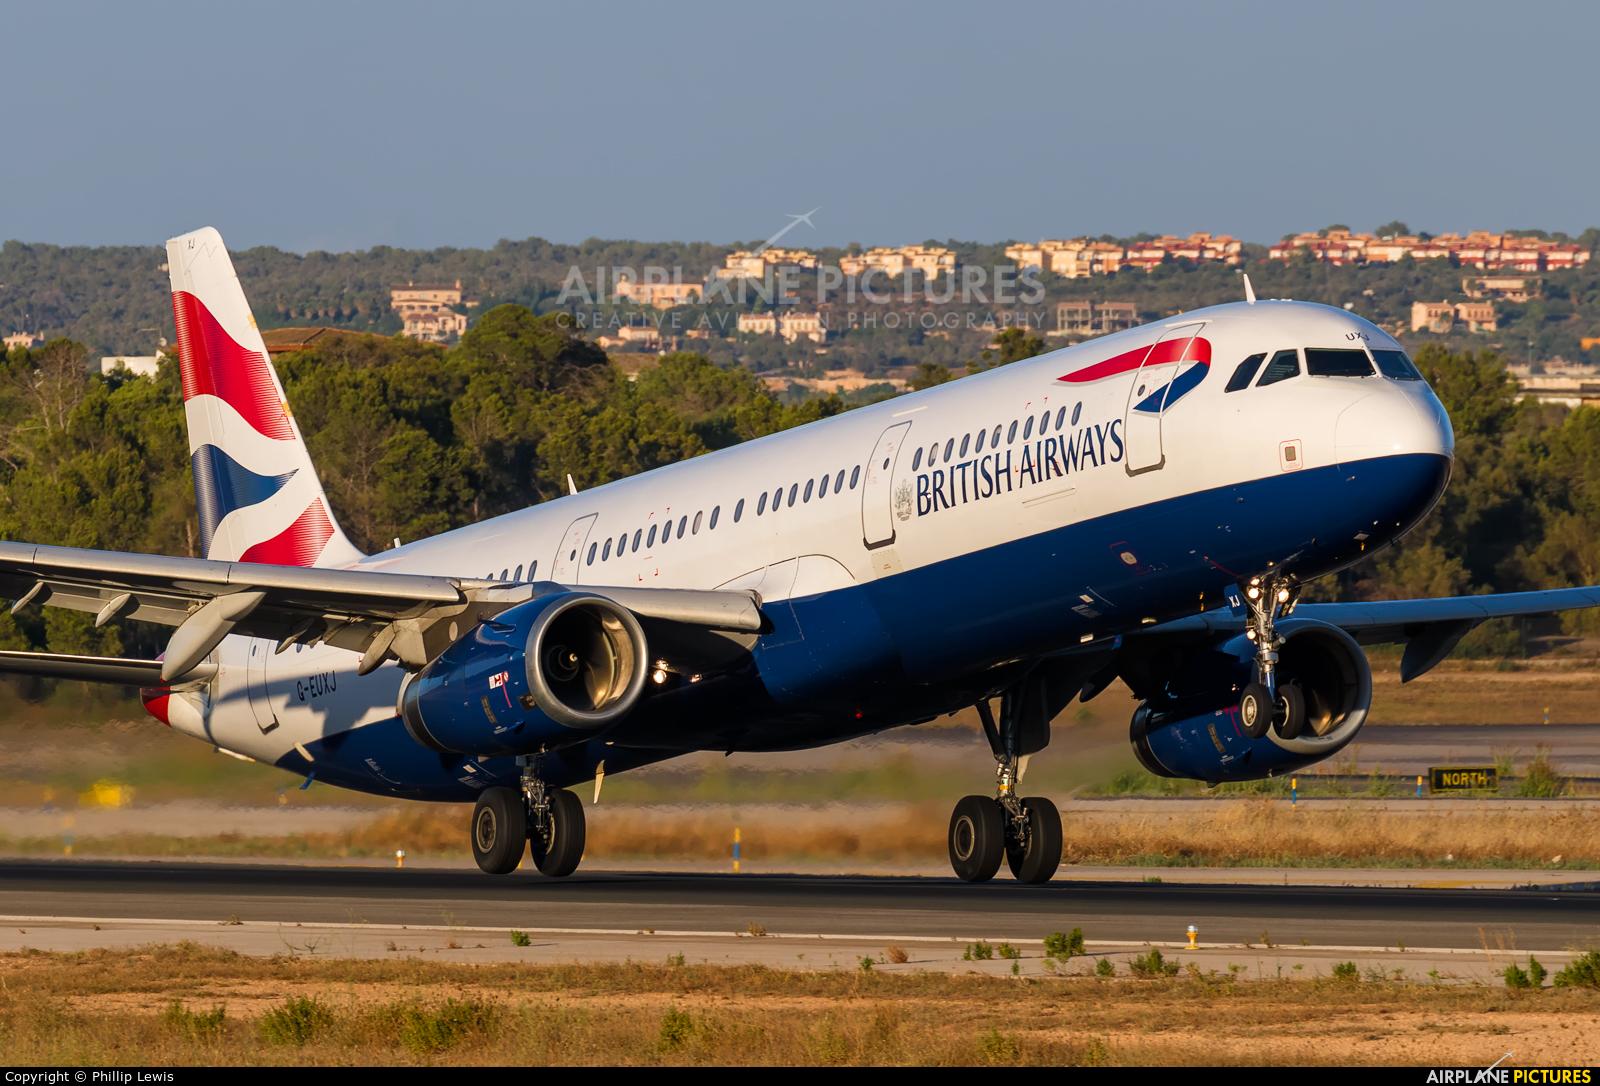 British Airways G-EUXJ aircraft at Palma de Mallorca